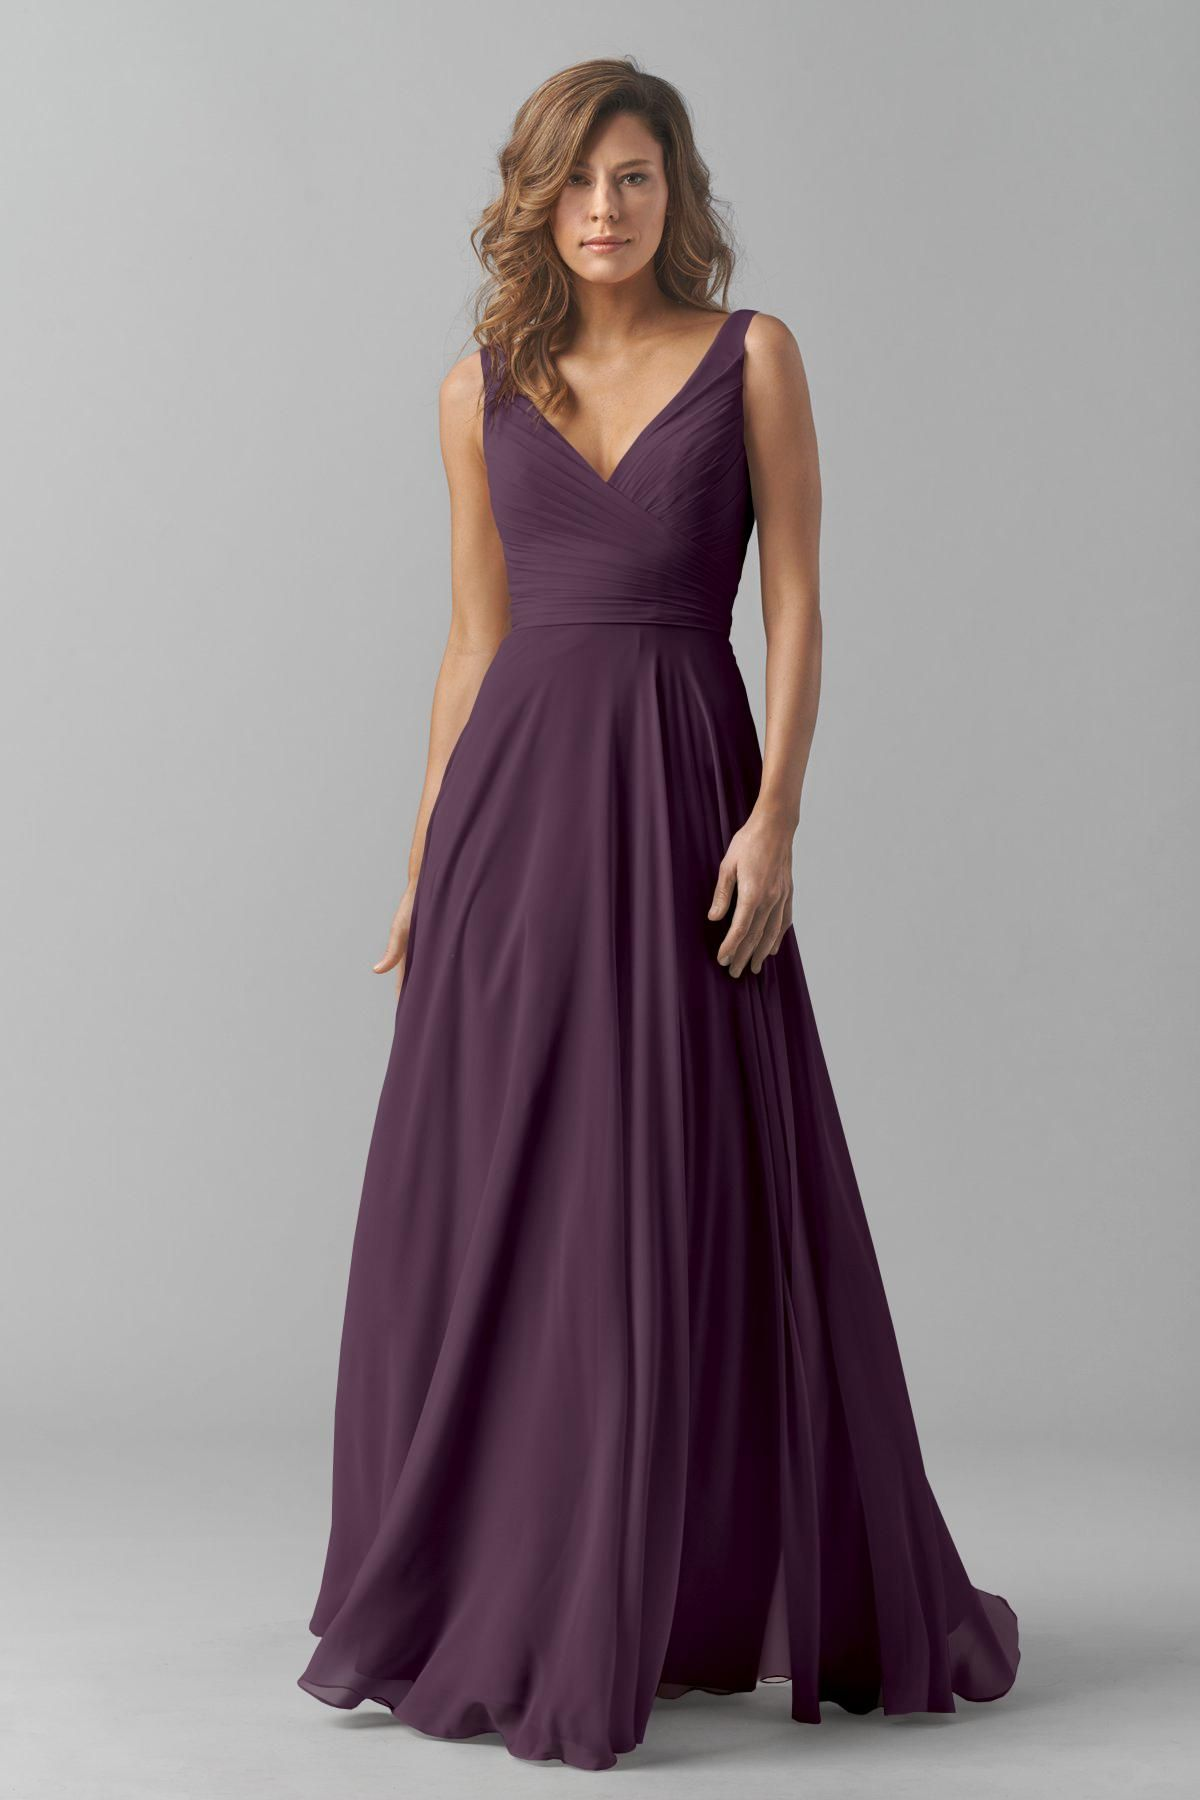 Gray A-line Chiffon V-neck Long Bridesmaid Dresses(BD1455) | Mum\'s ...